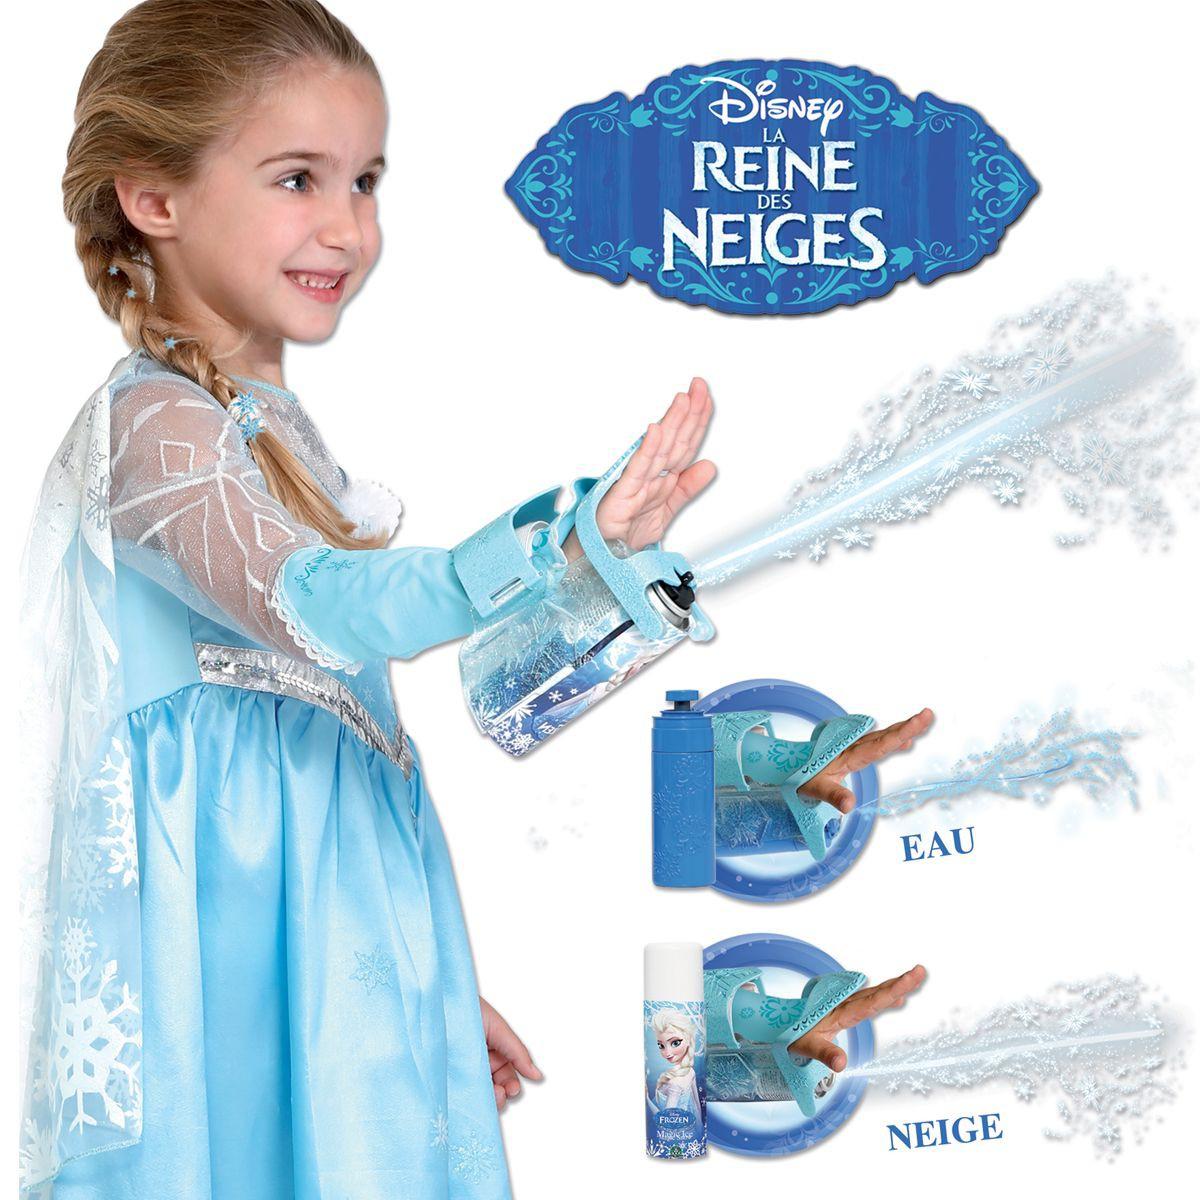 reine des neiges gant lance neige